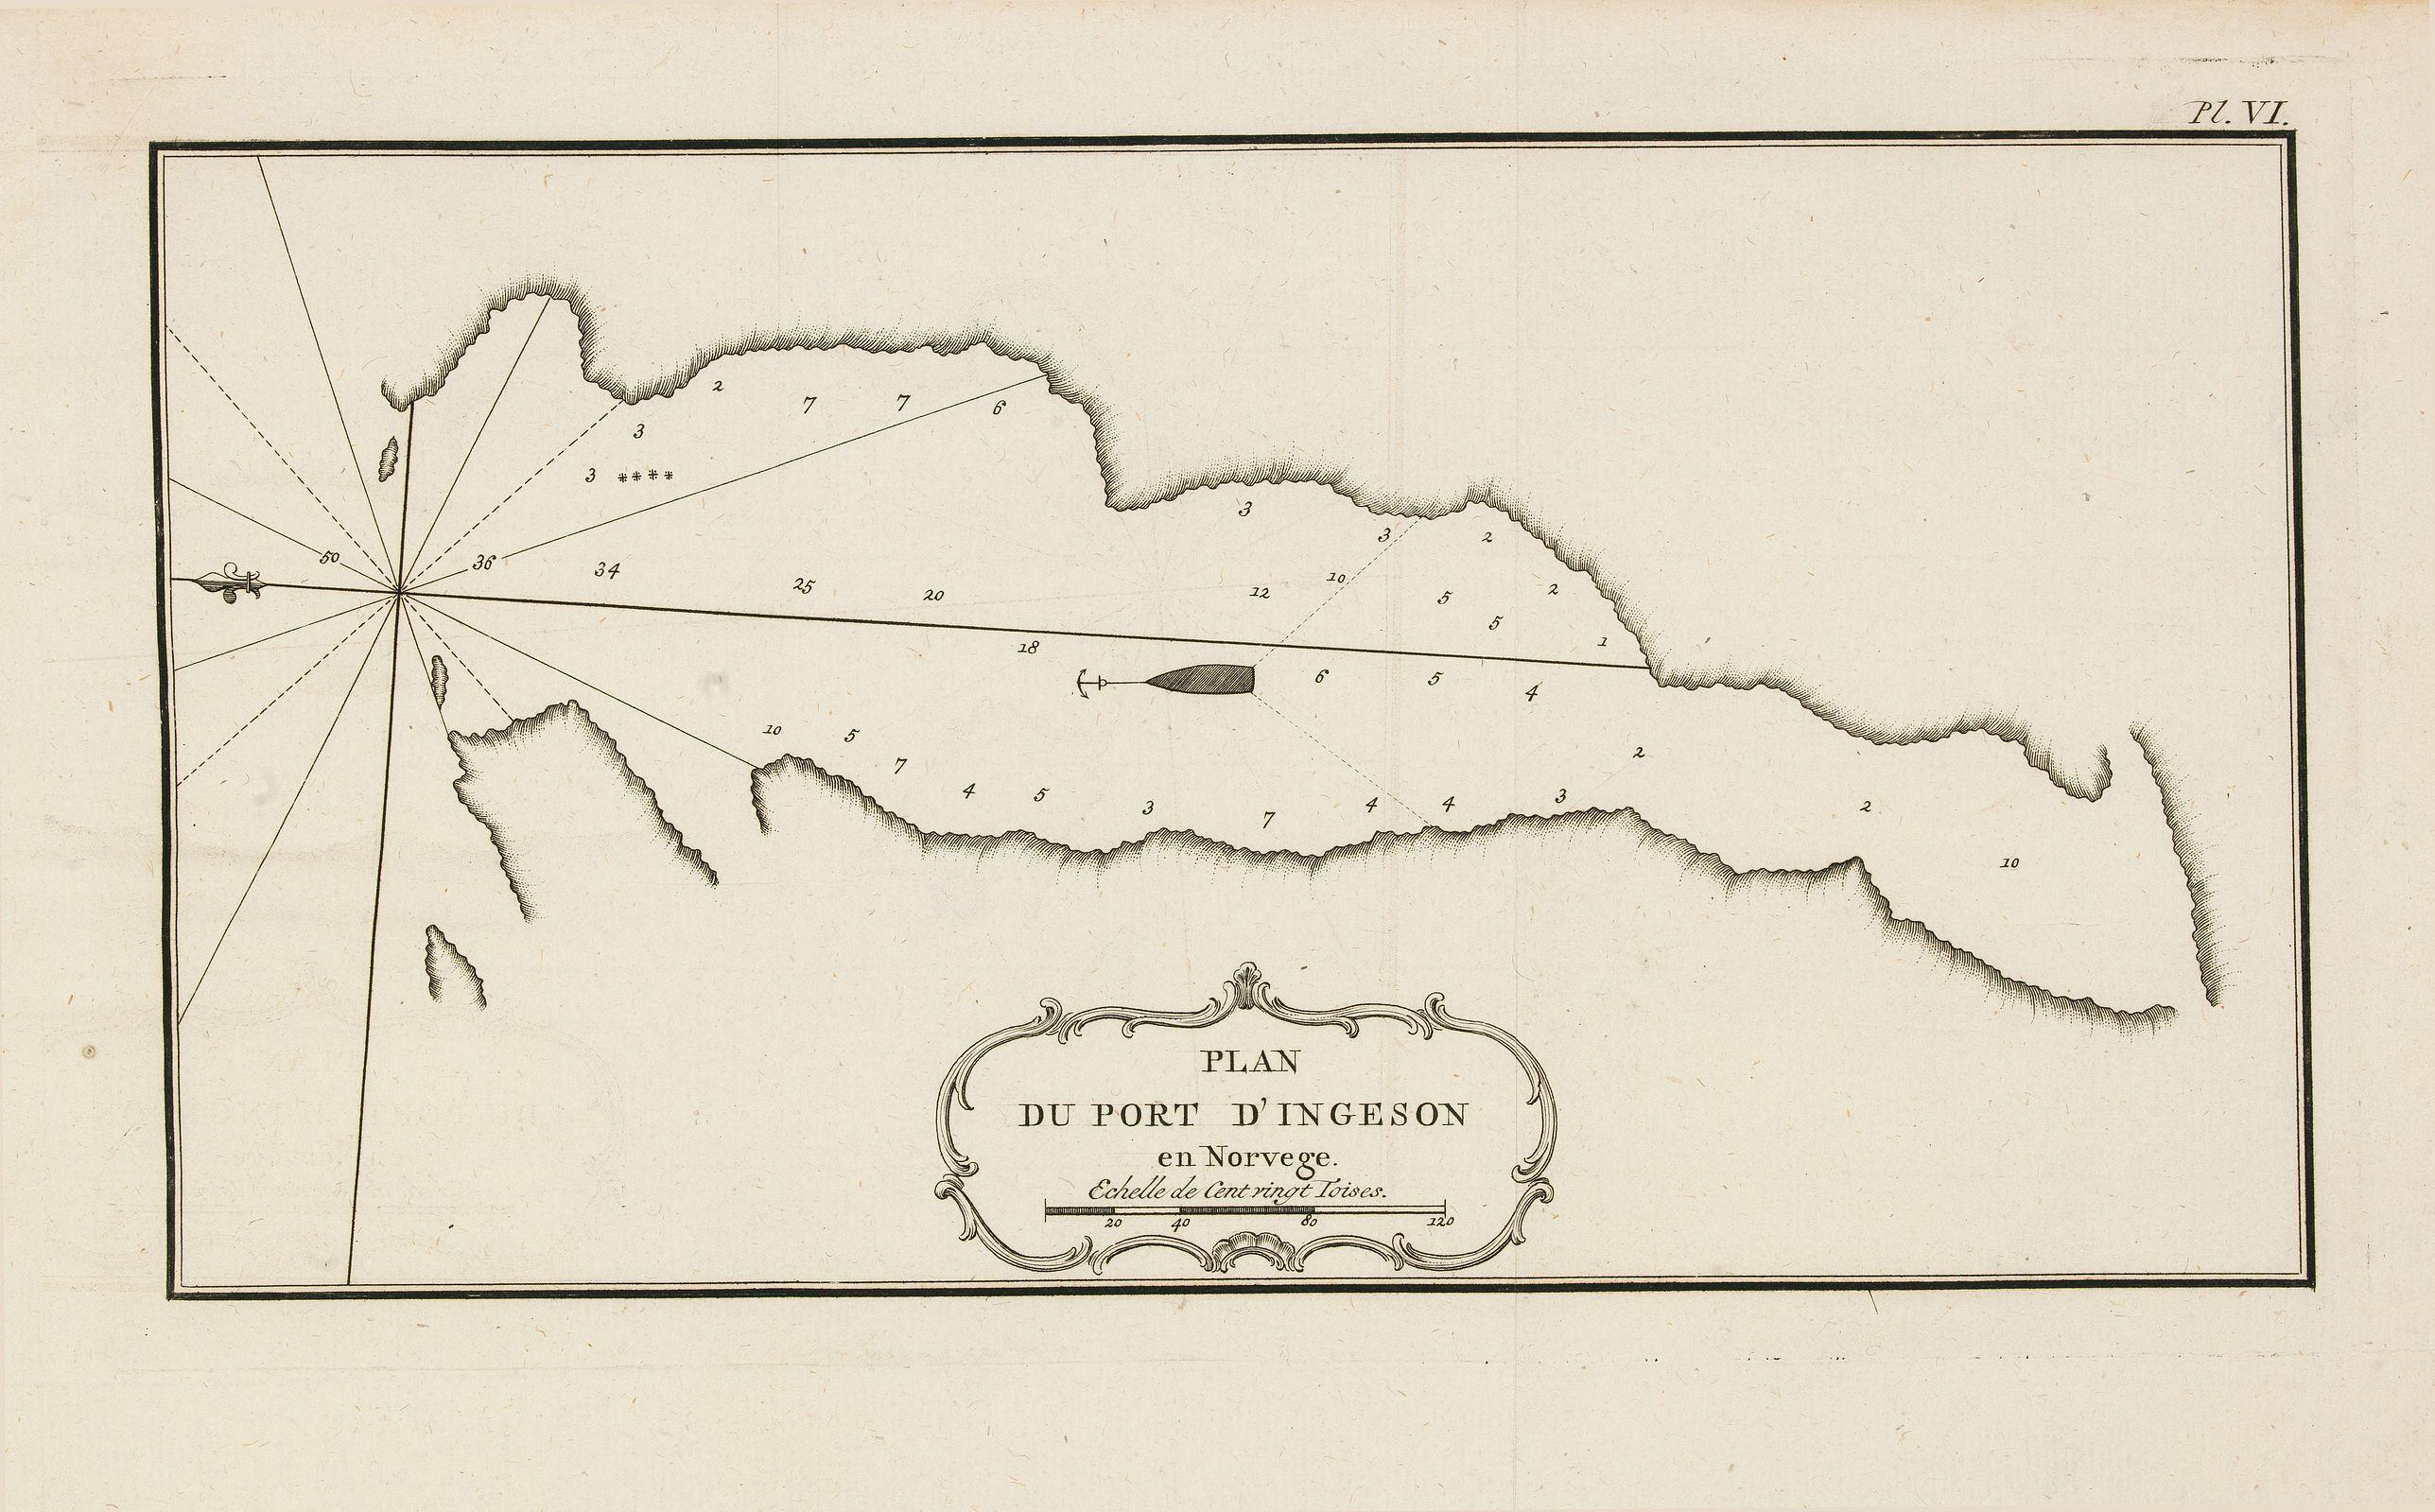 BELLIN, J.N. -  Plan du port d'Ingeson en Norvege.